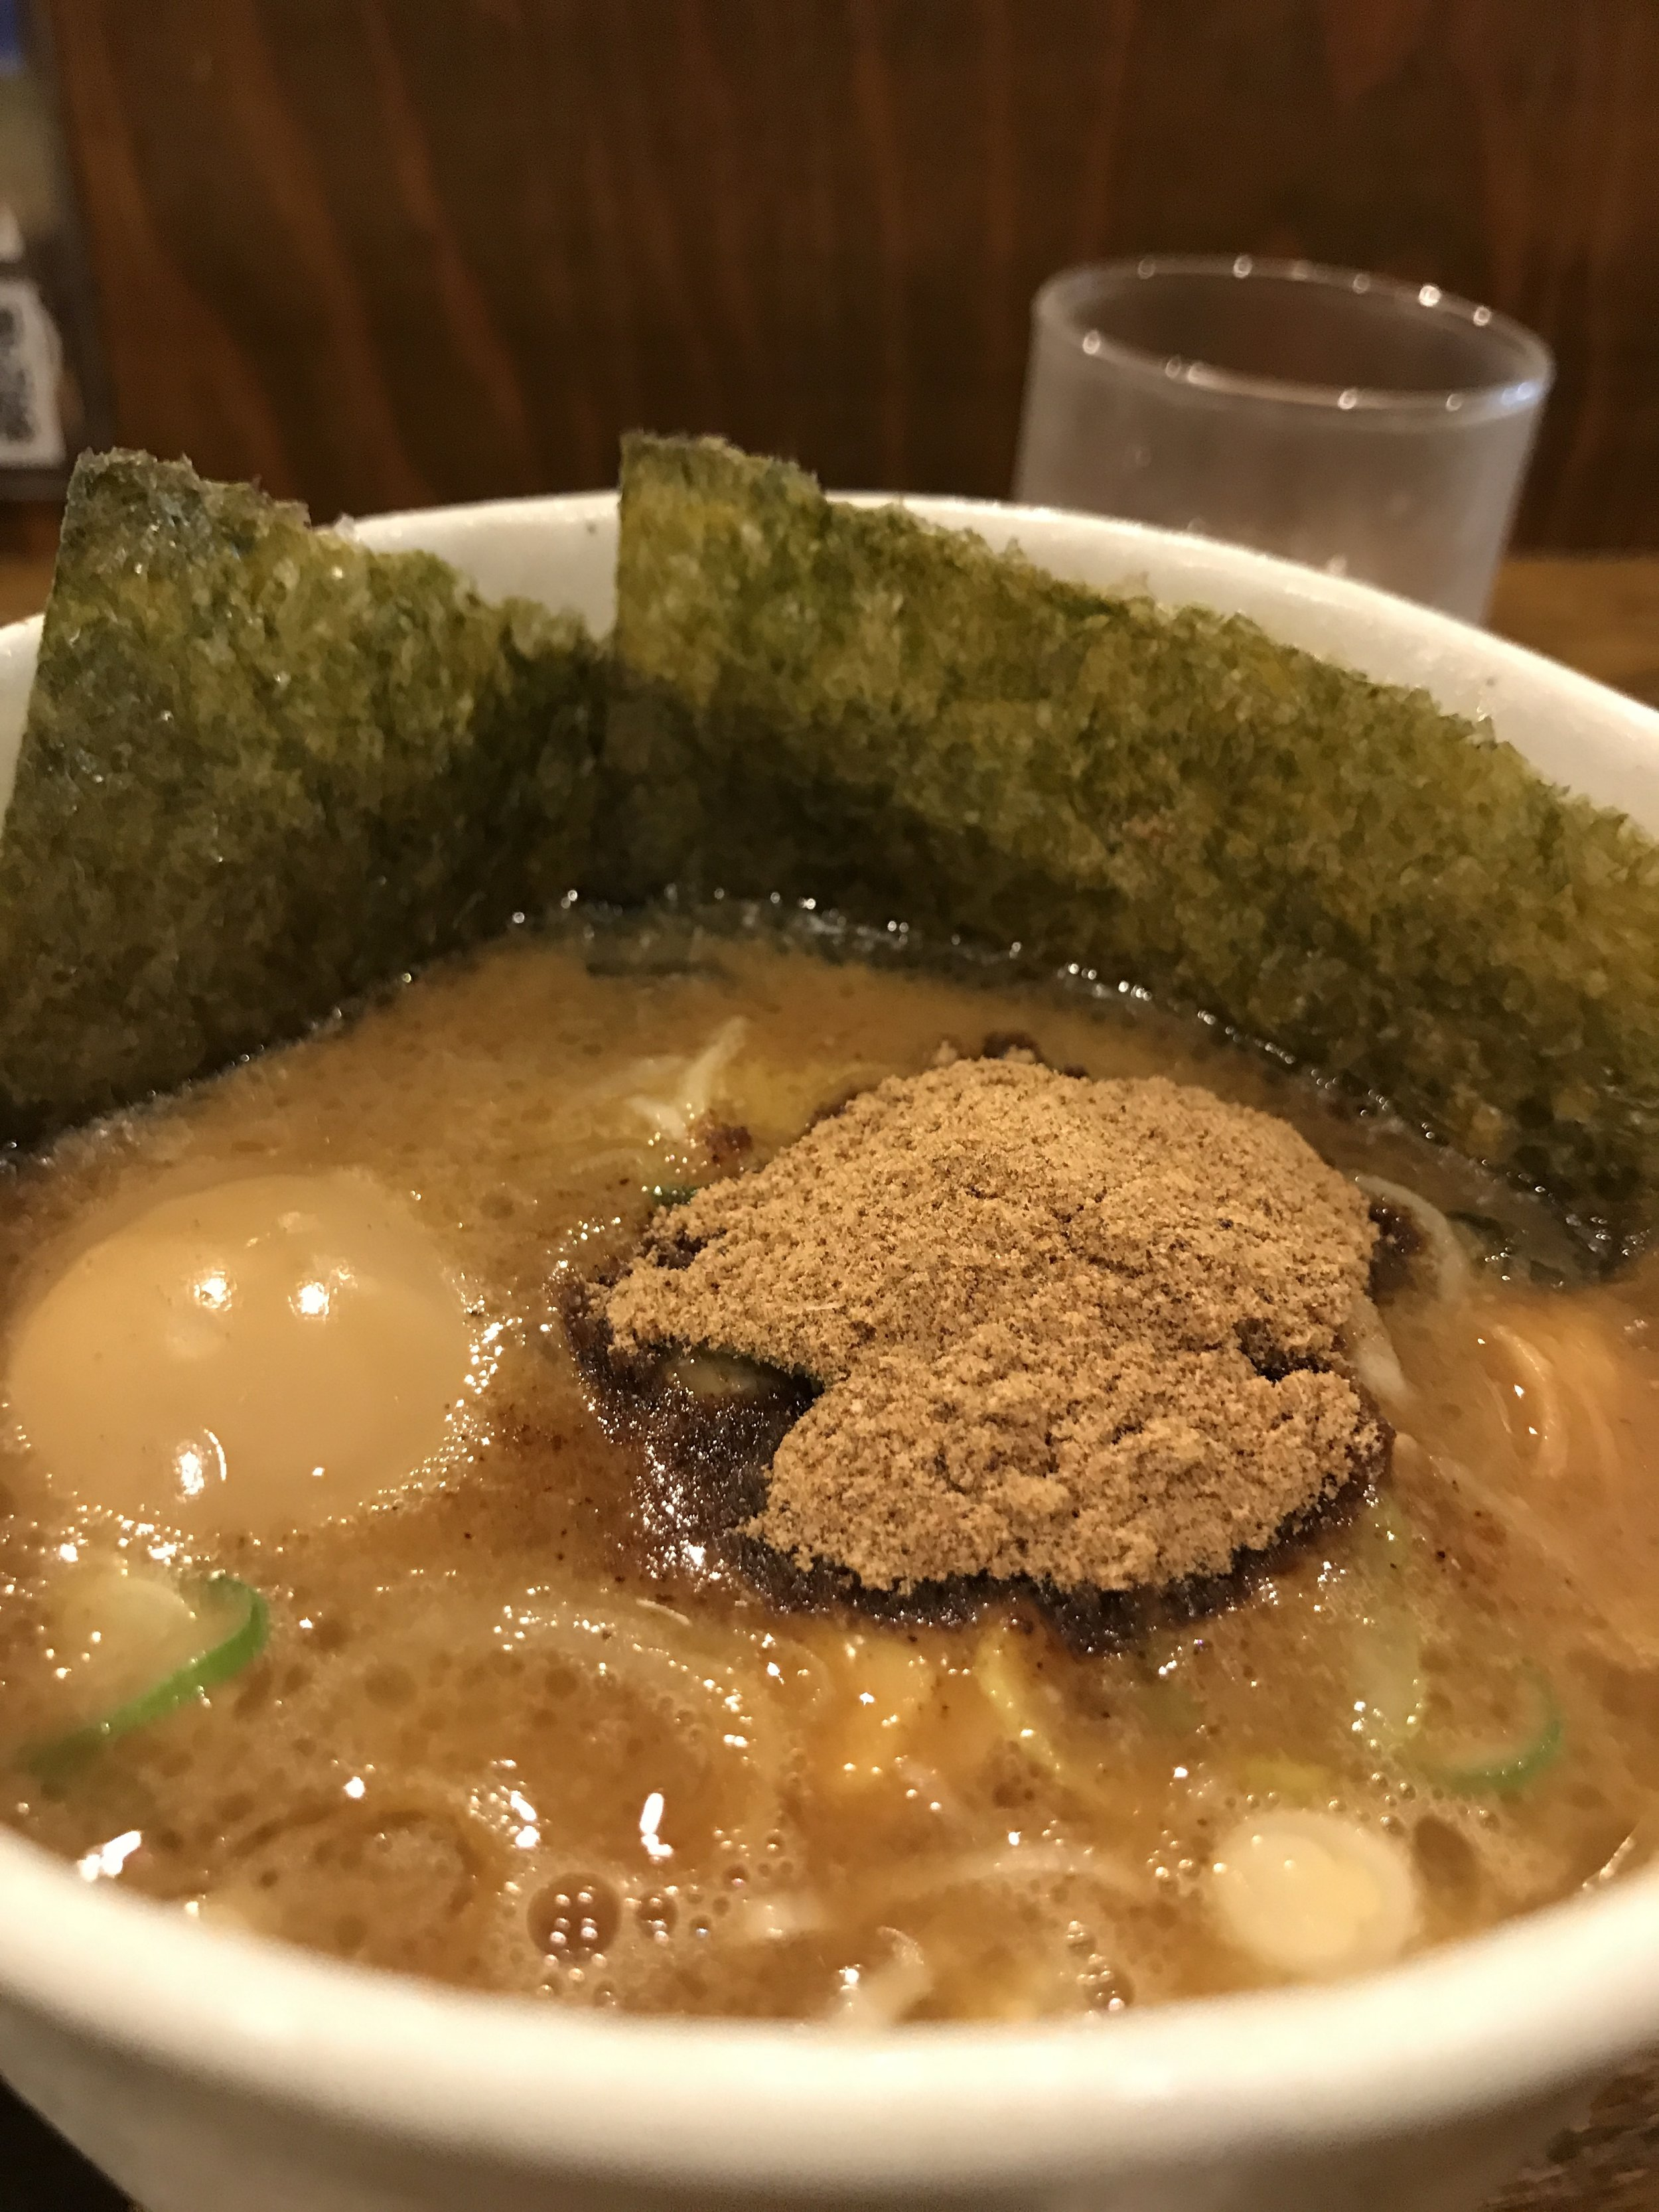 fuunji tsukemen dipping sauce